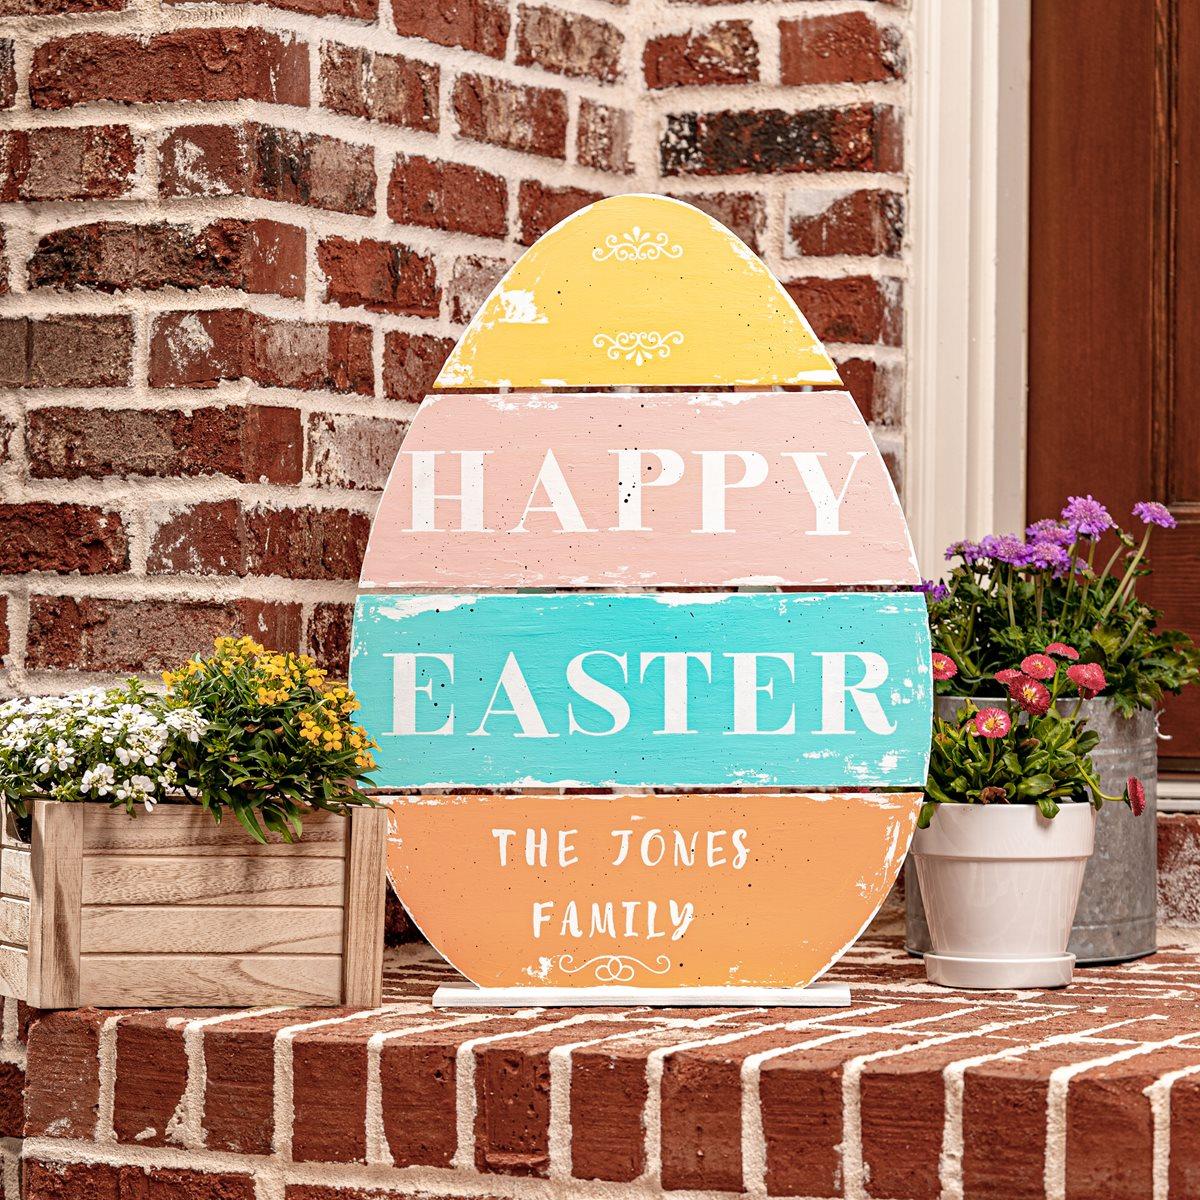 Happy Easter Large Wooden Egg Sign